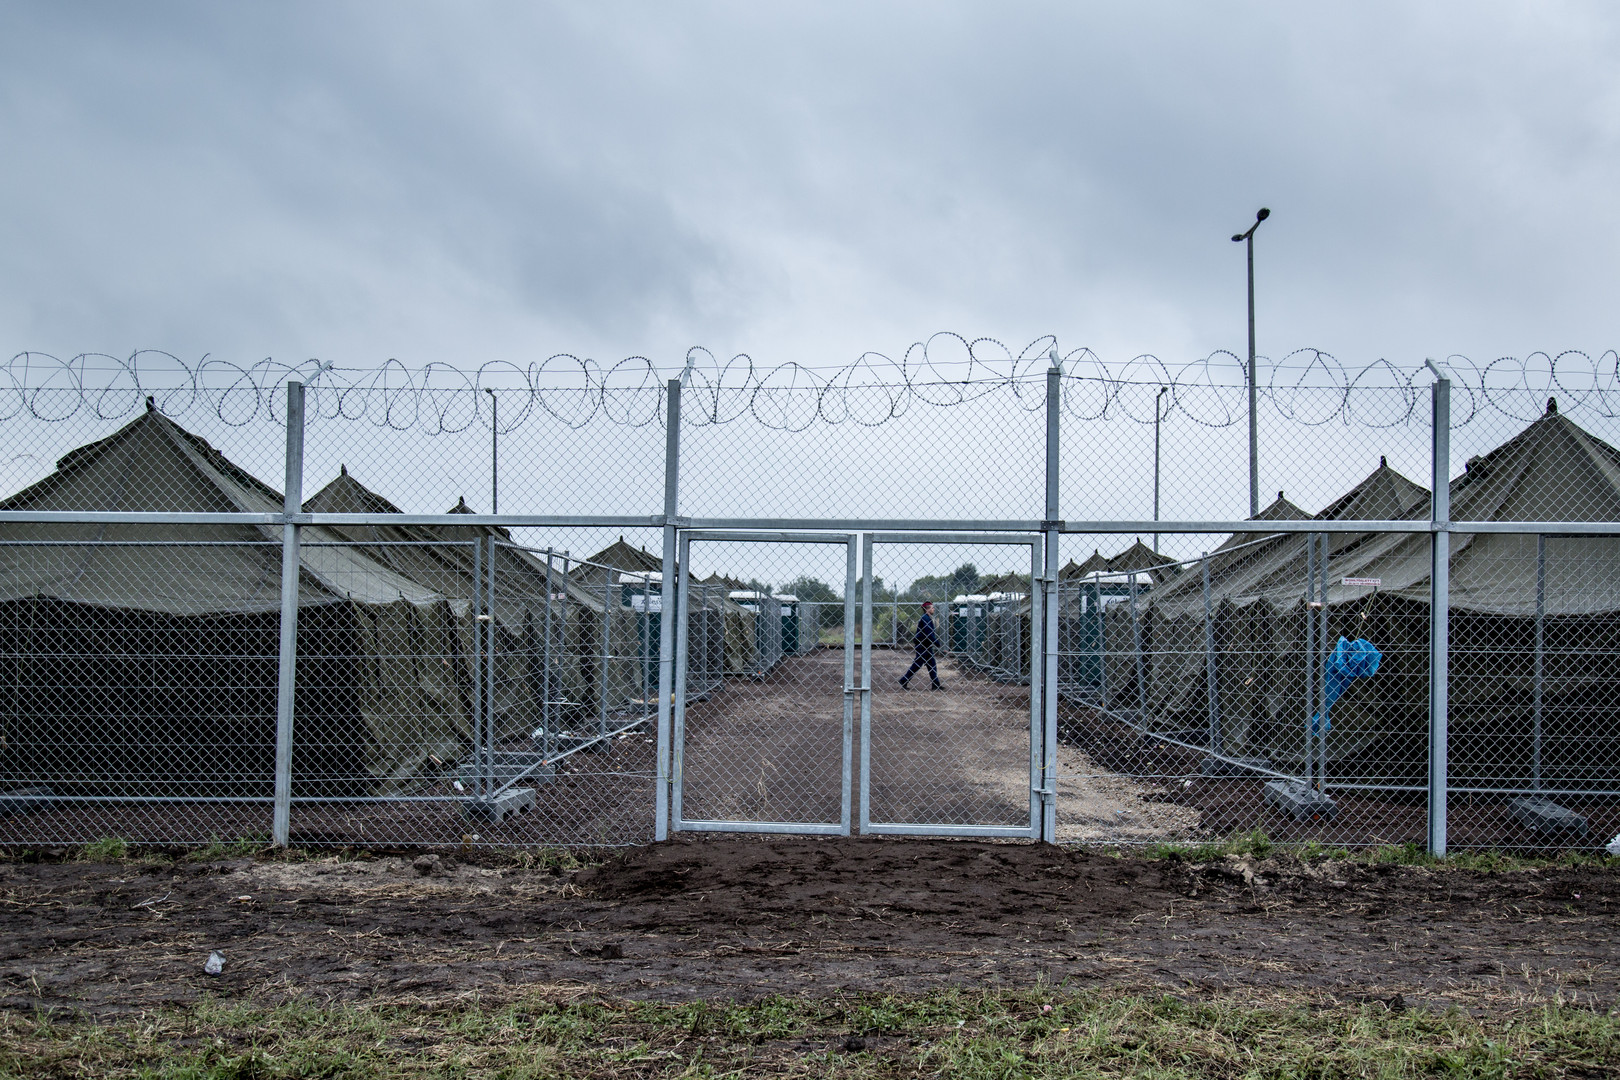 Registration Camp at Roszke, Hungary.